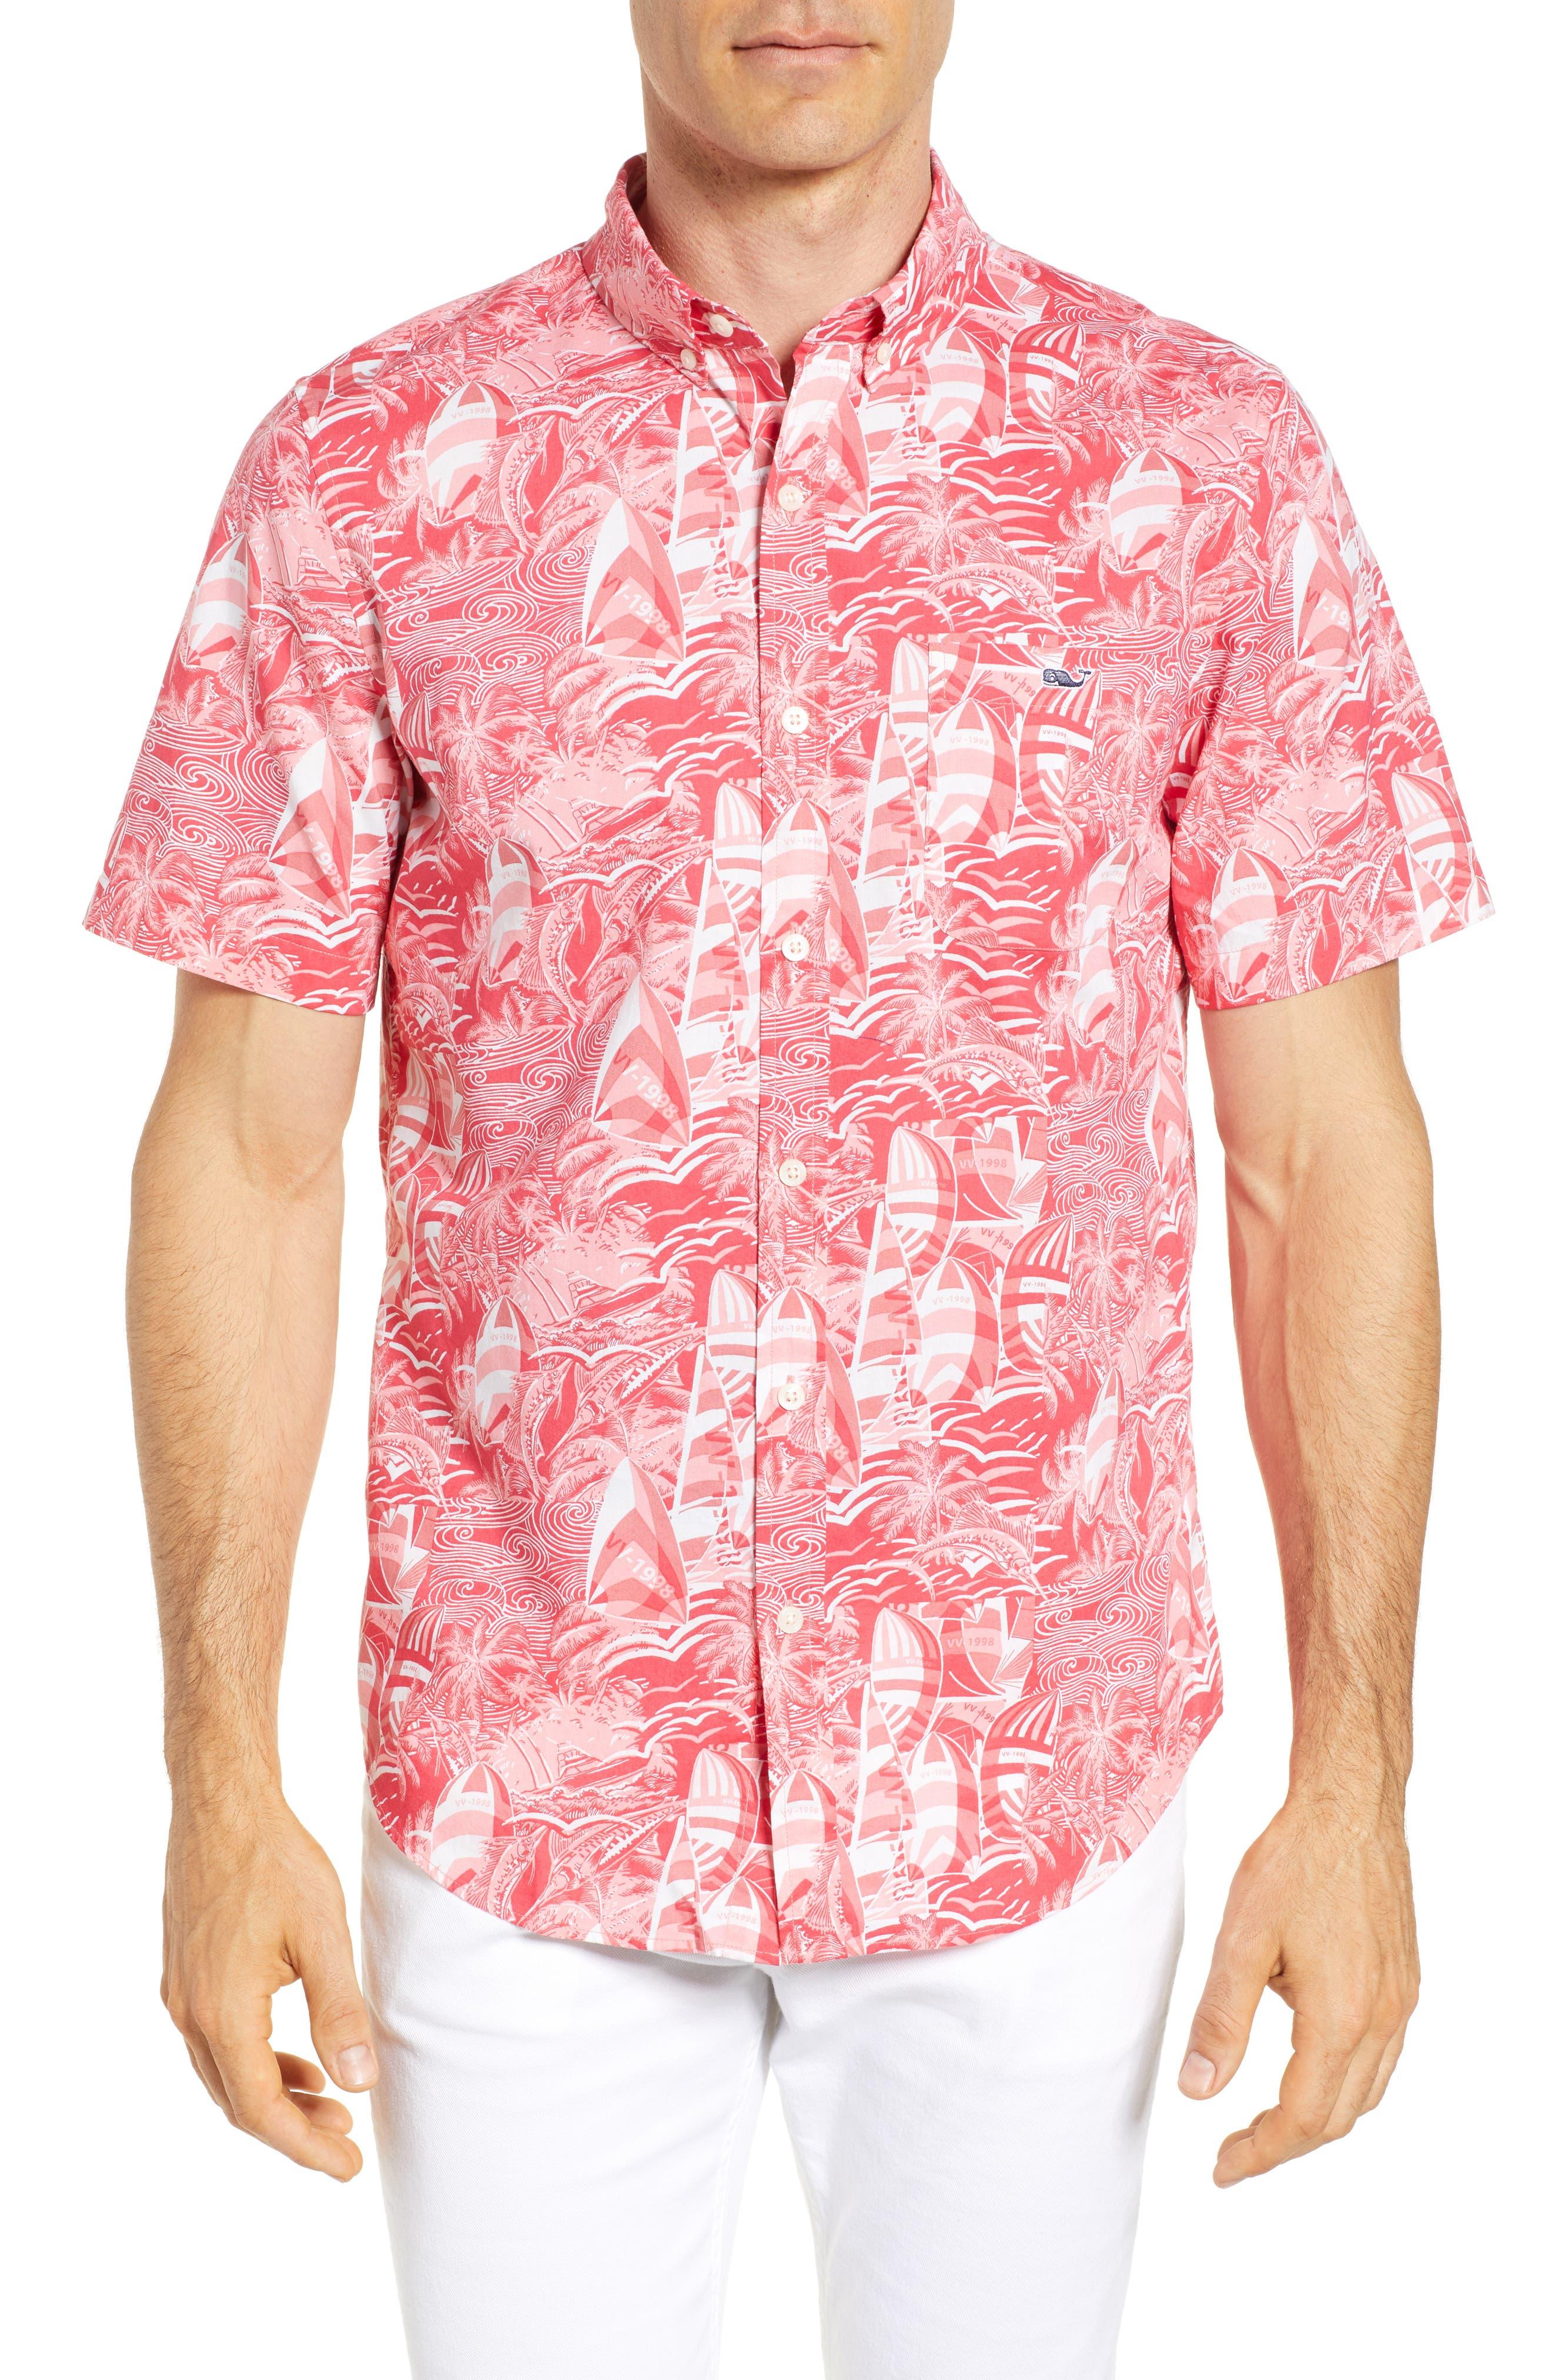 At Sea Tucker Slim Fit Sport Shirt,                             Main thumbnail 1, color,                             SAILORS RED